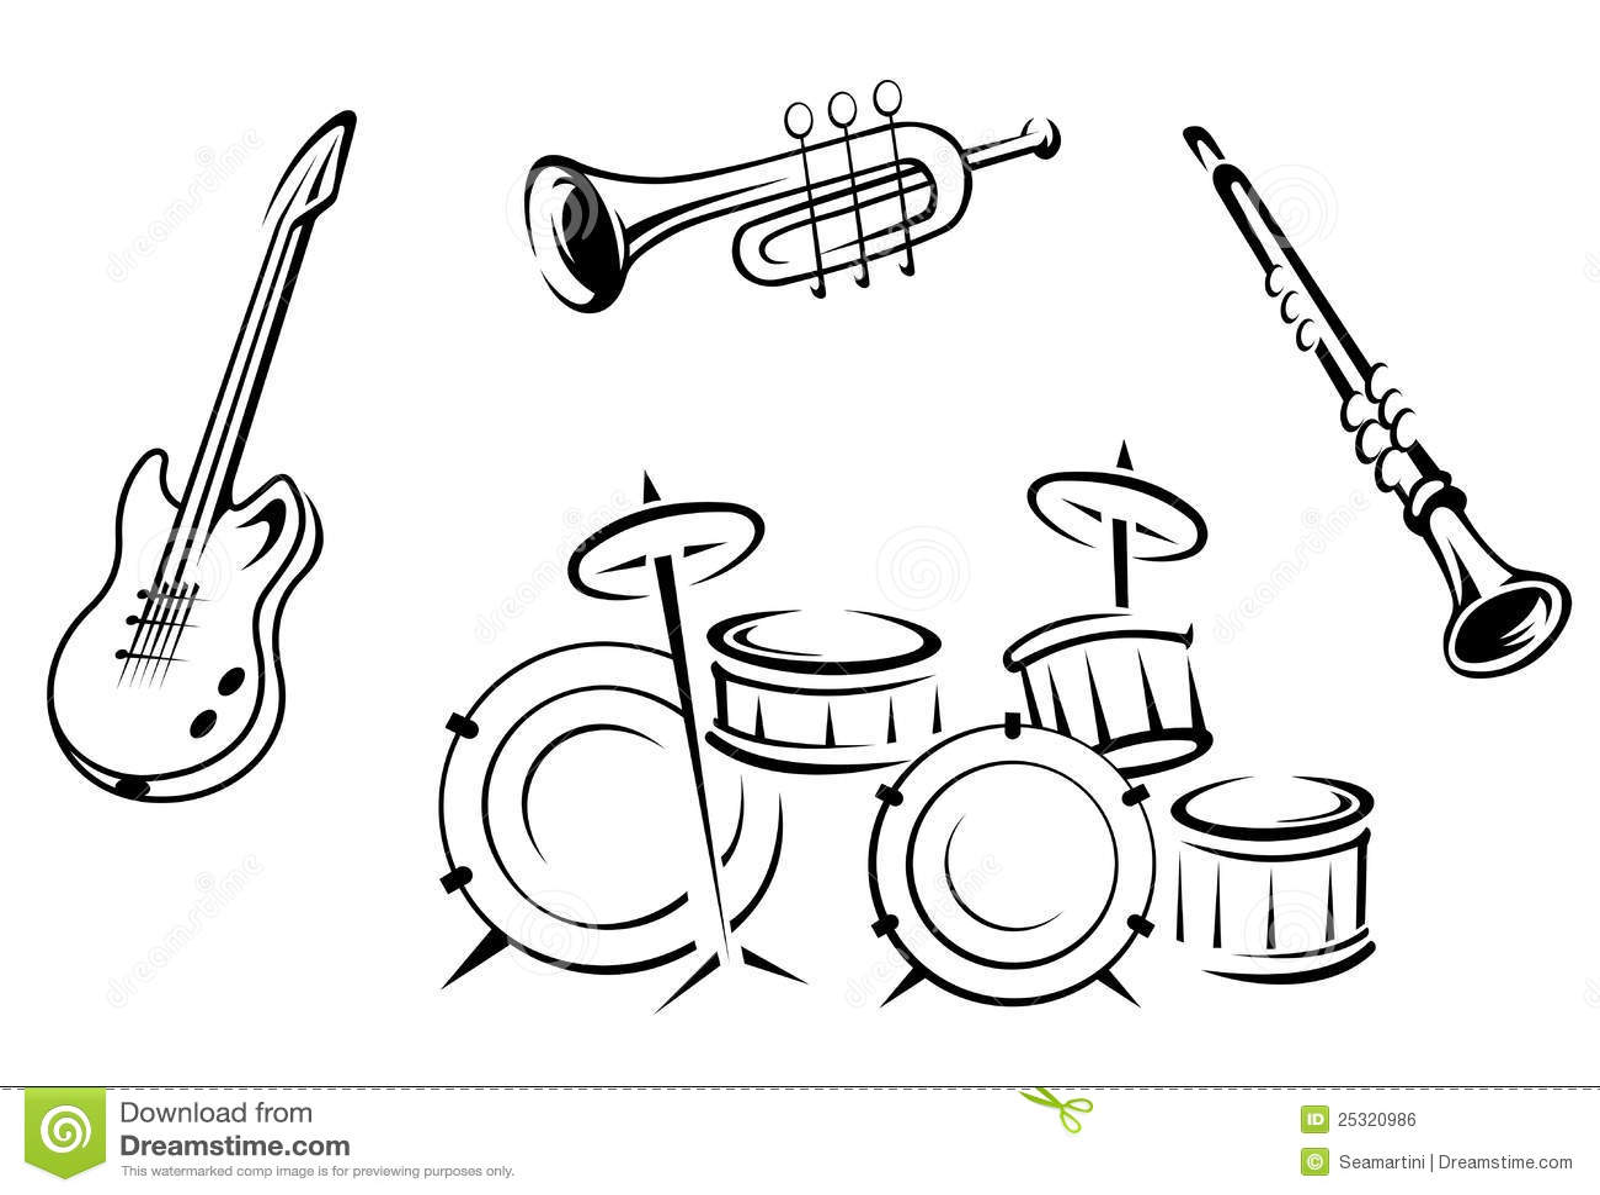 Set Musikinstrumente Lizenzfreies Stockbild - Bild: 25320986